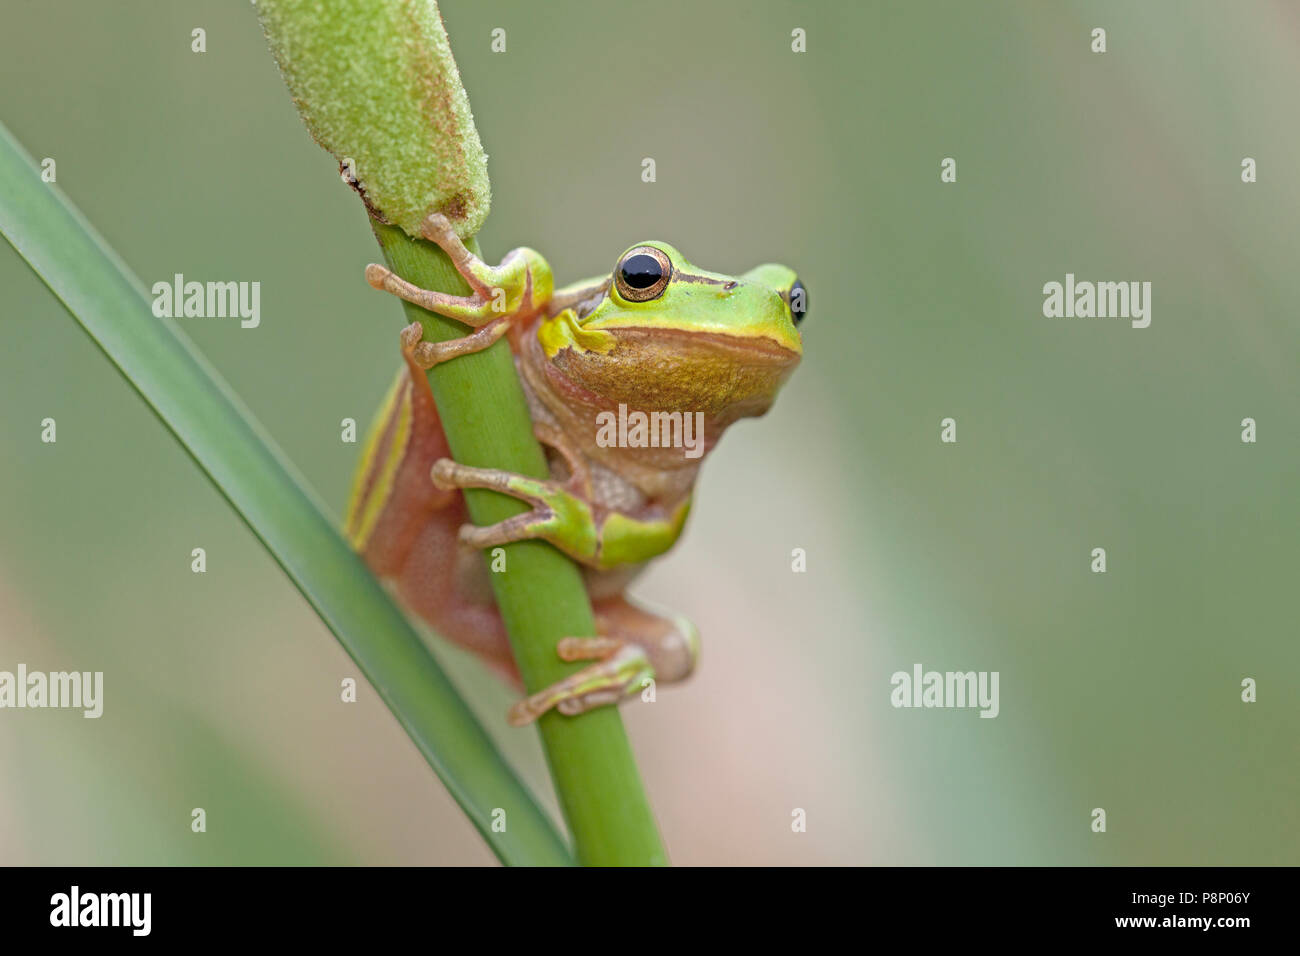 Hyla Arborea; común Tree Frog Foto de stock